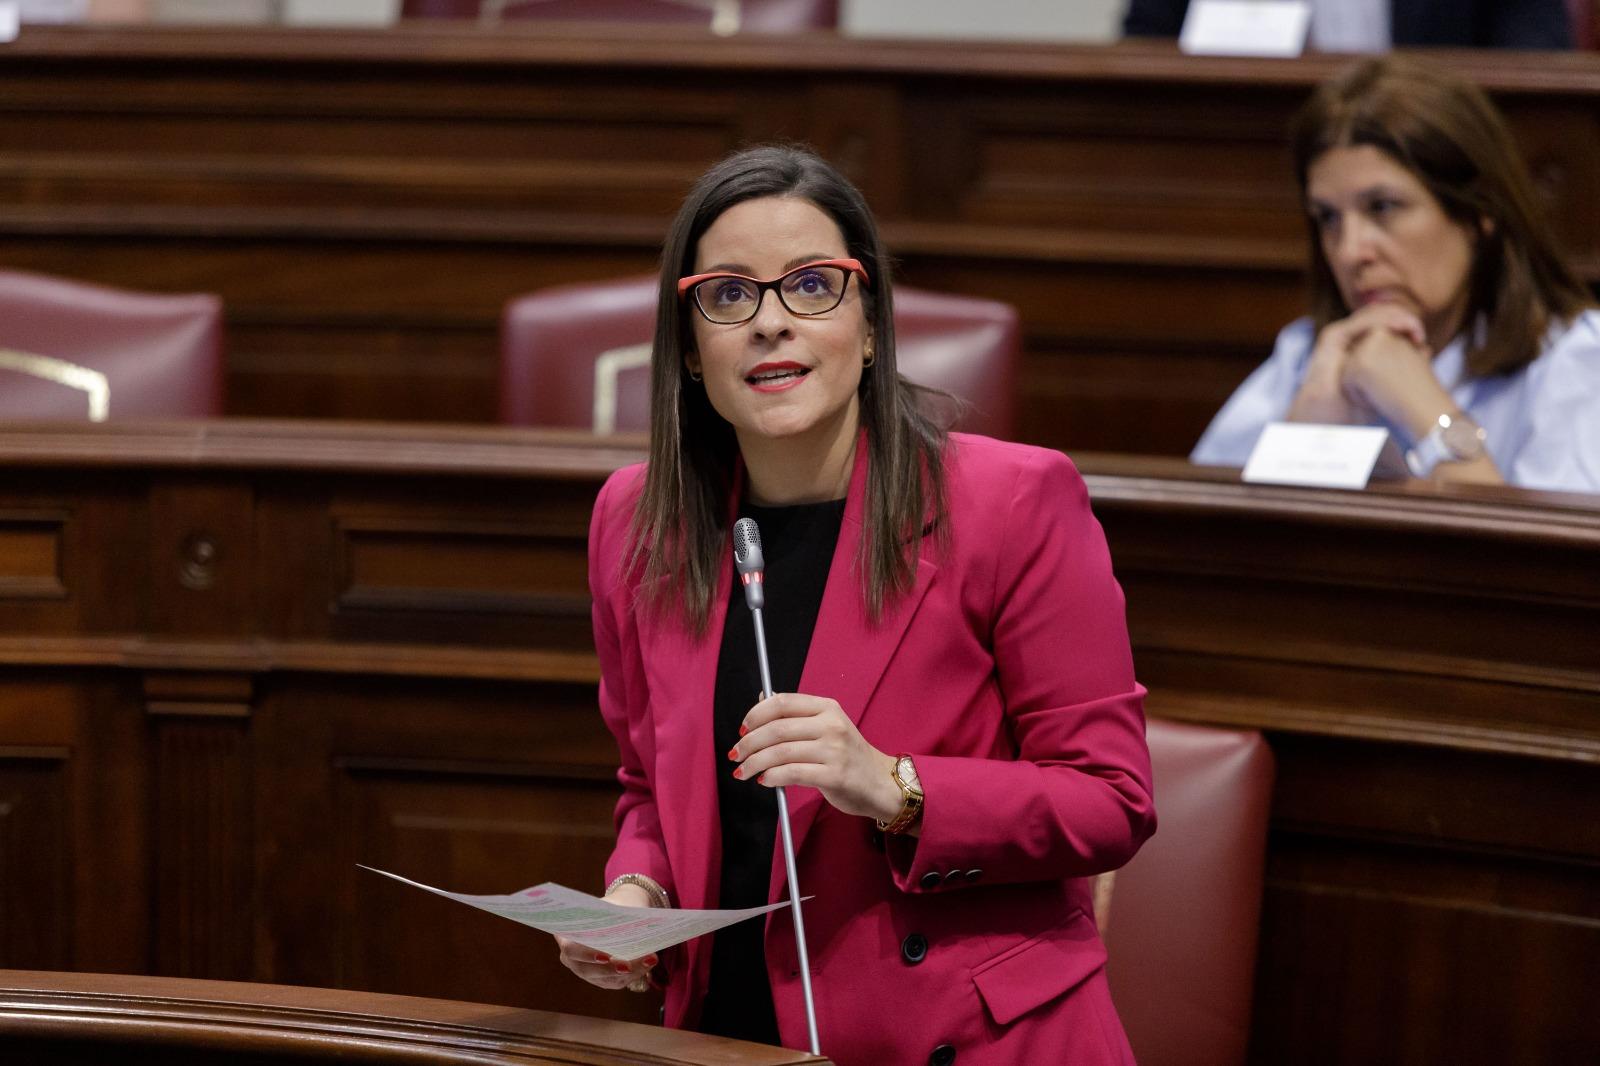 Yaiza Castilla parlamento